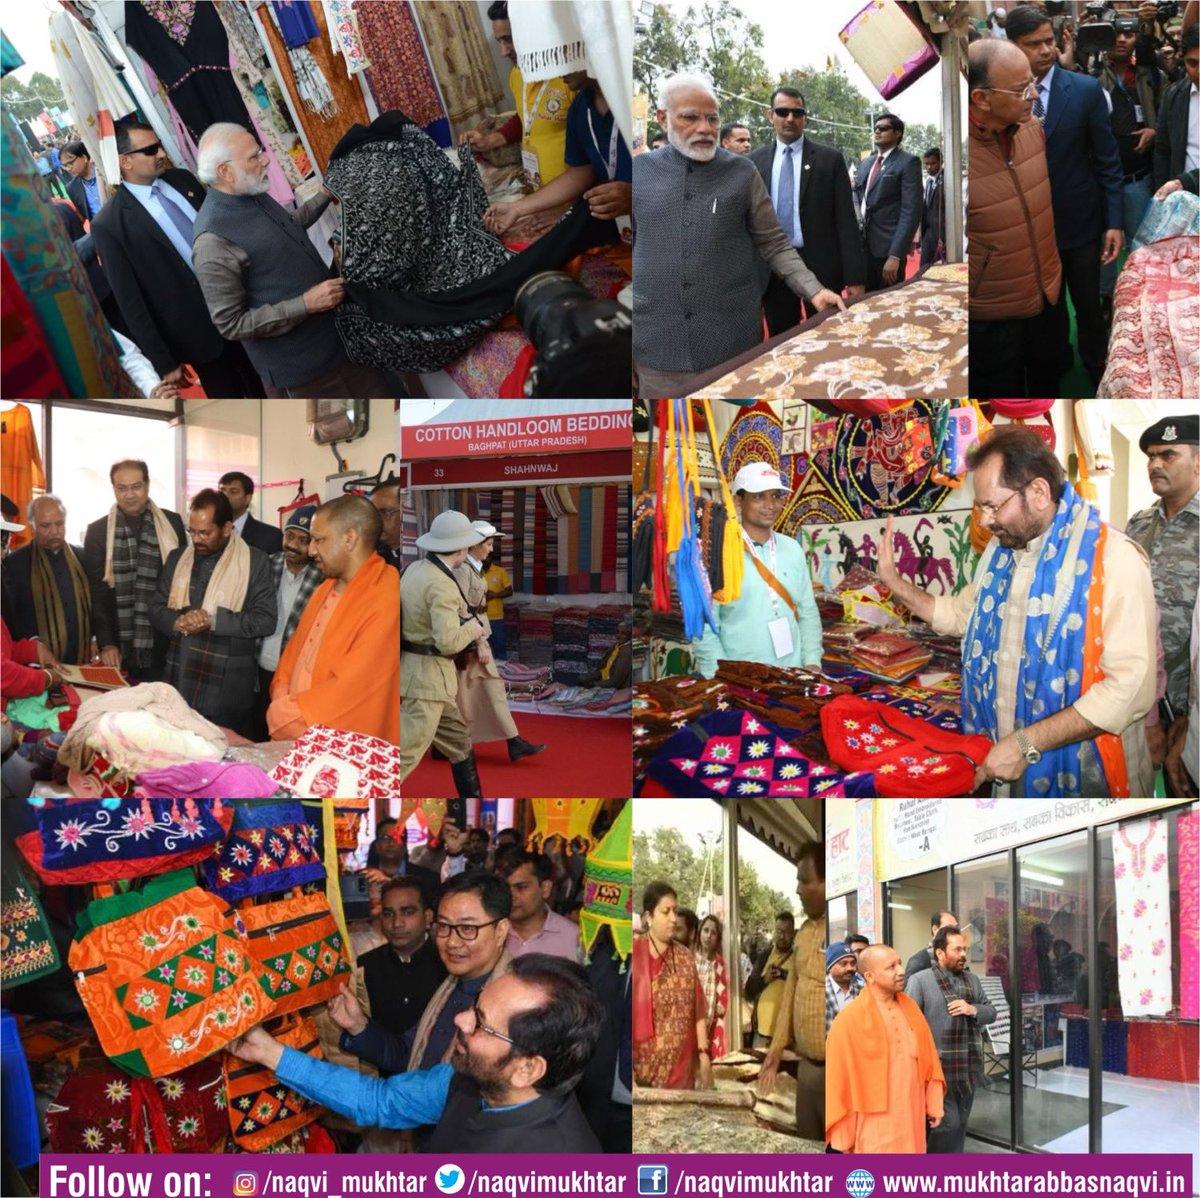 "#HunarHaat an effective & credible platform to make the country's handloom weavers, artisans as ""Self-reliant"". Warm greetings to weavers & artisans on #NationalHandloomDay #Vocal4Handmade #AatmaNirbharBharat"